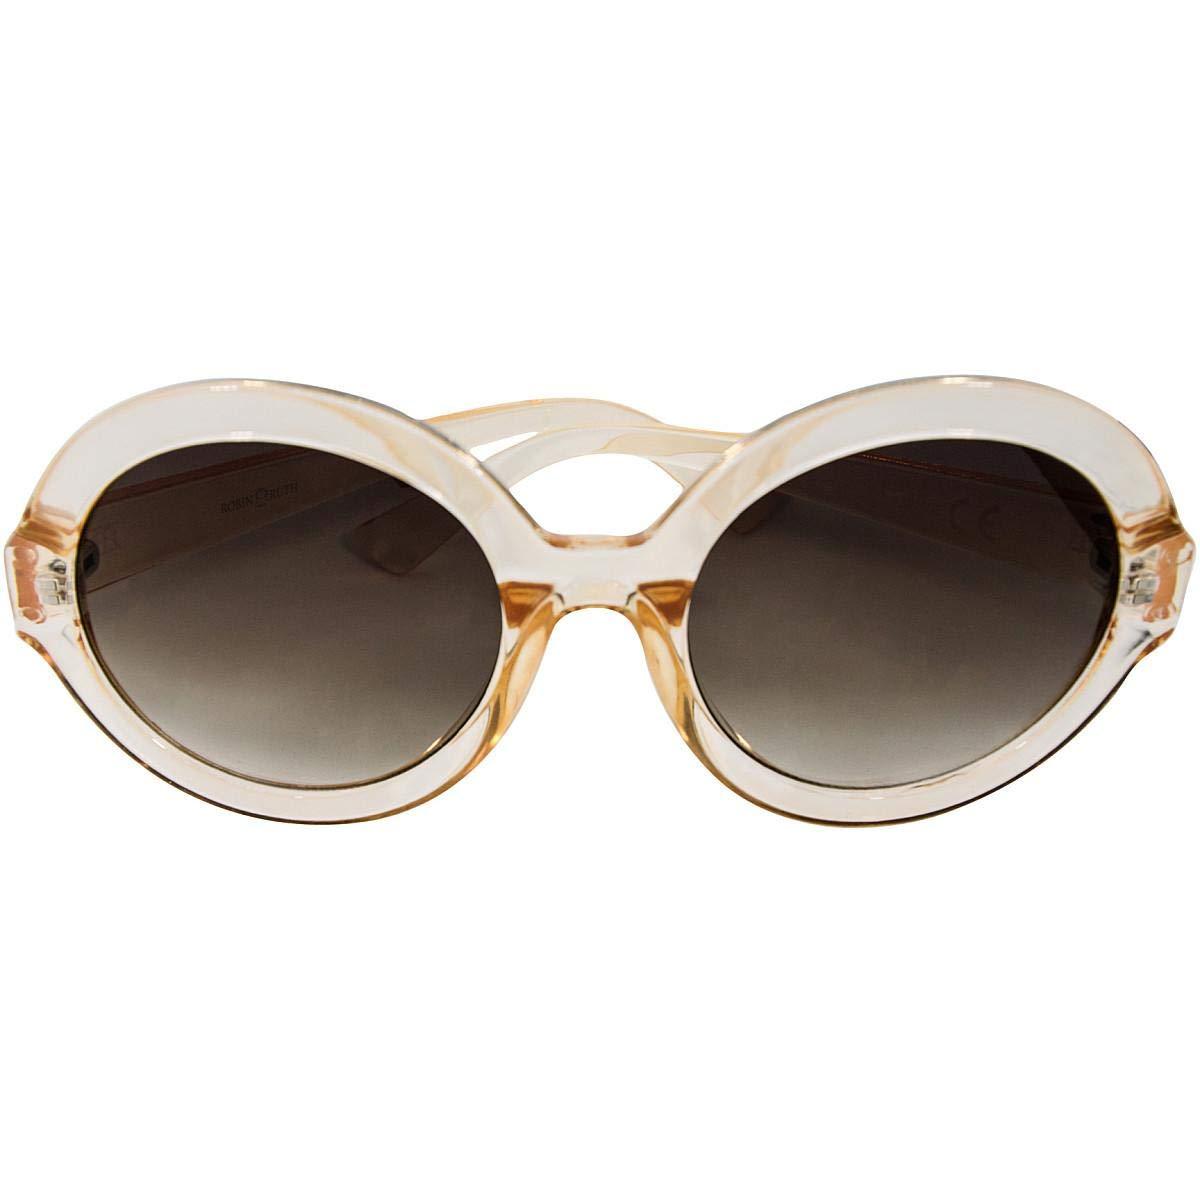 4edda09236b Amazon.com  Robin Ruth NUREET Limited Collection Designer Sunglasses-Peach   Sports   Outdoors